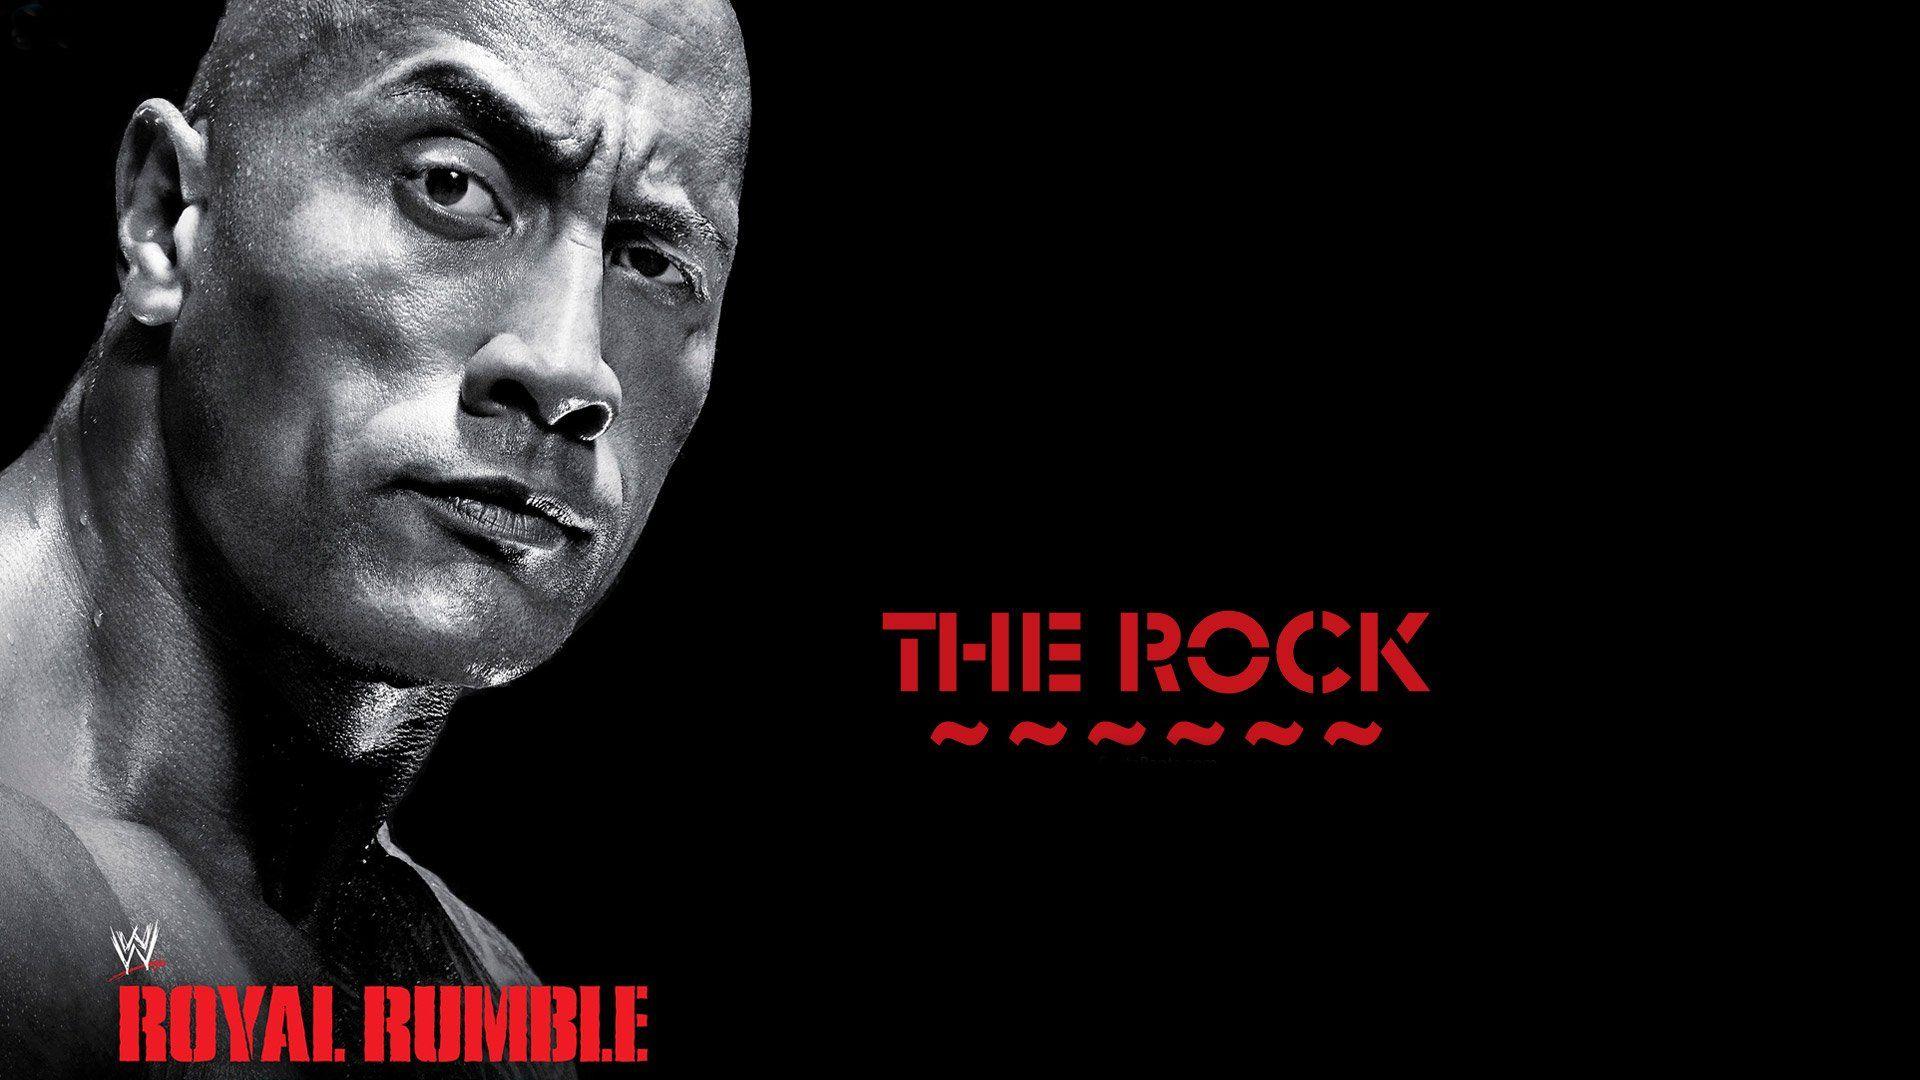 Wallpaper of the rock wwe superstars wwe wallpapers wwe - Rock wwe images hd ...